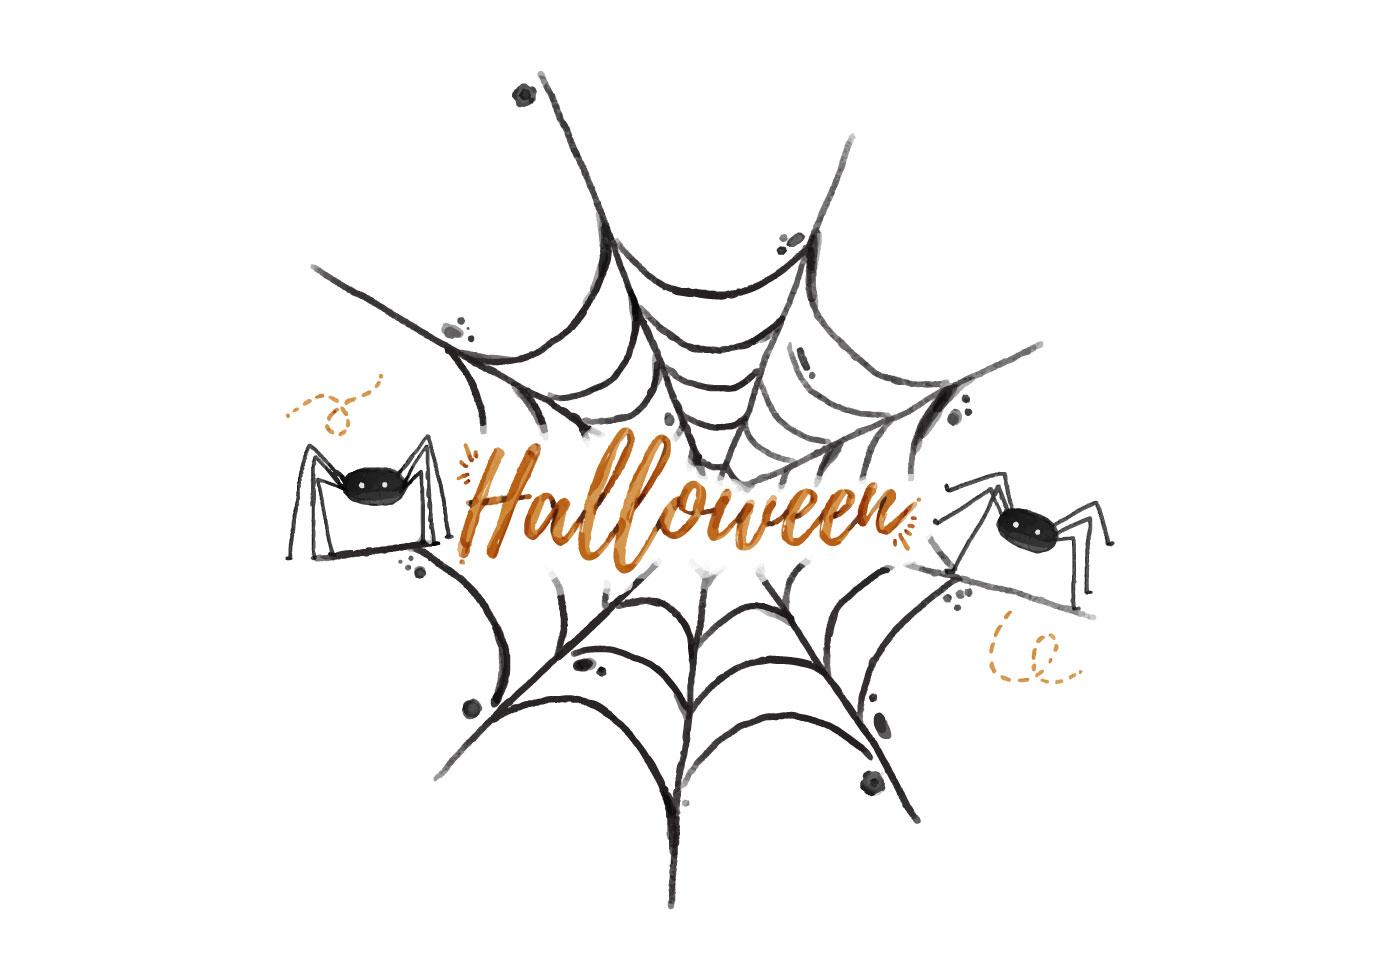 Spider Web Halloween Watercolor Vector